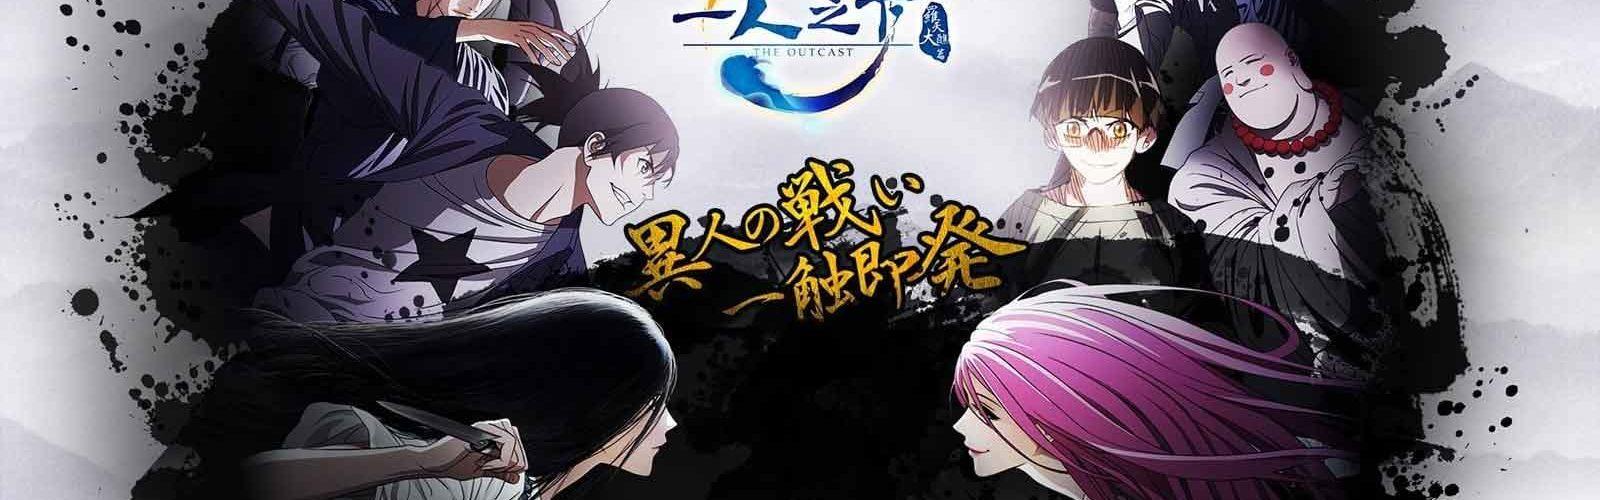 Hitori No Shita The Outcast Season 4